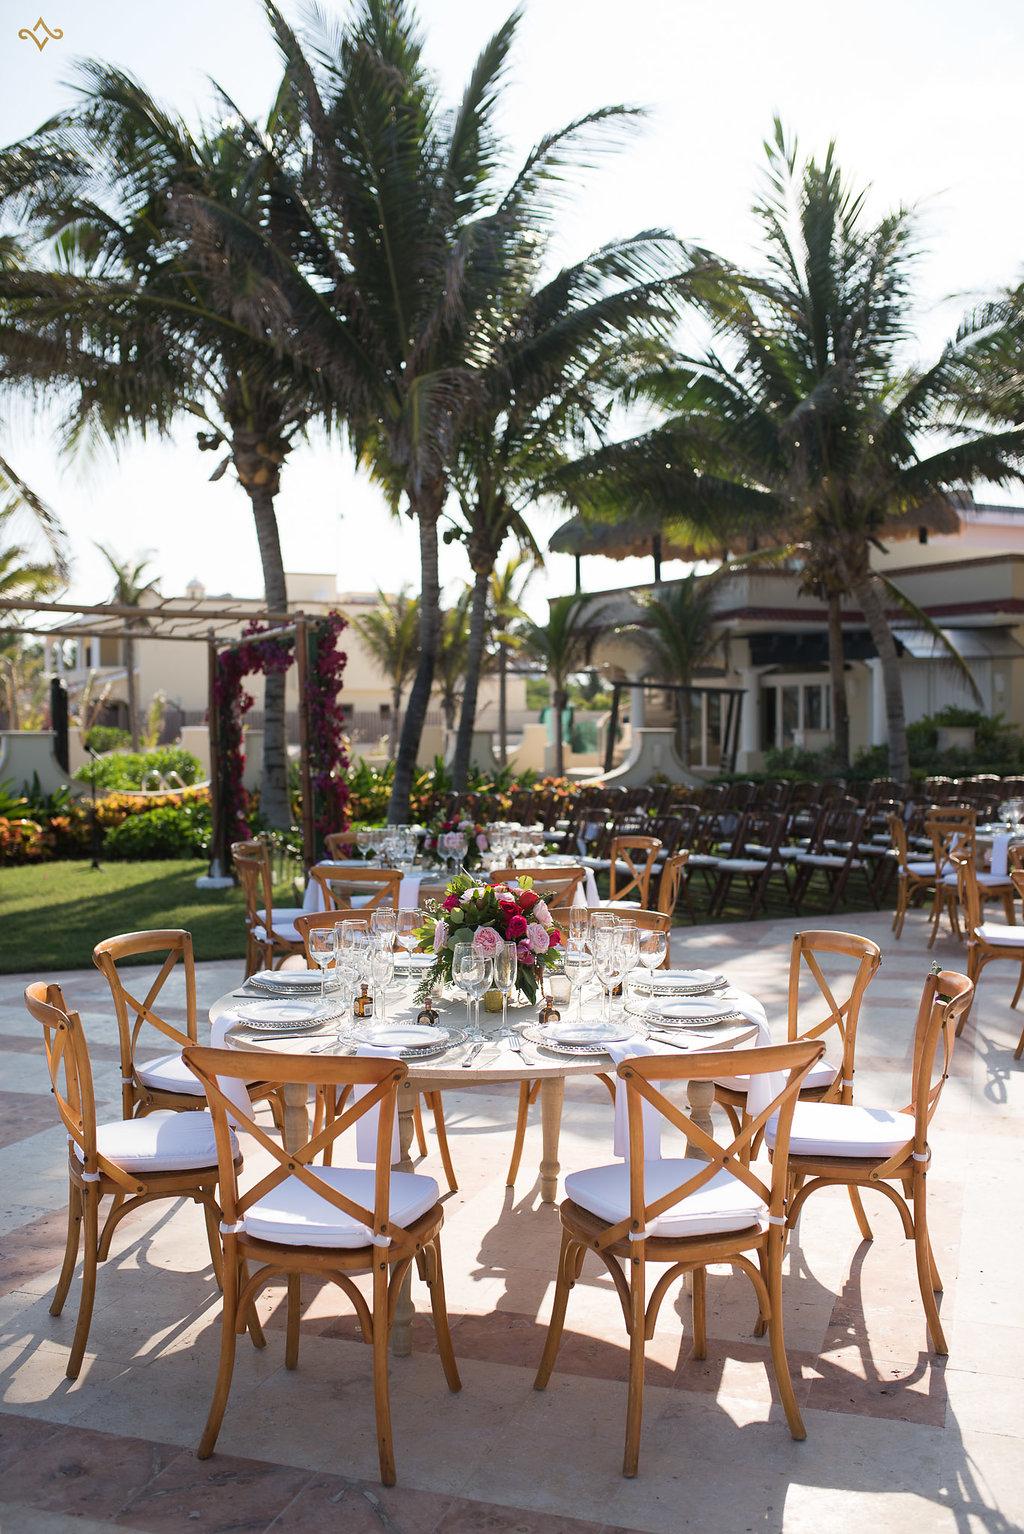 cancun-destination-wedding-mexico-villa-la-joya-31.jpg